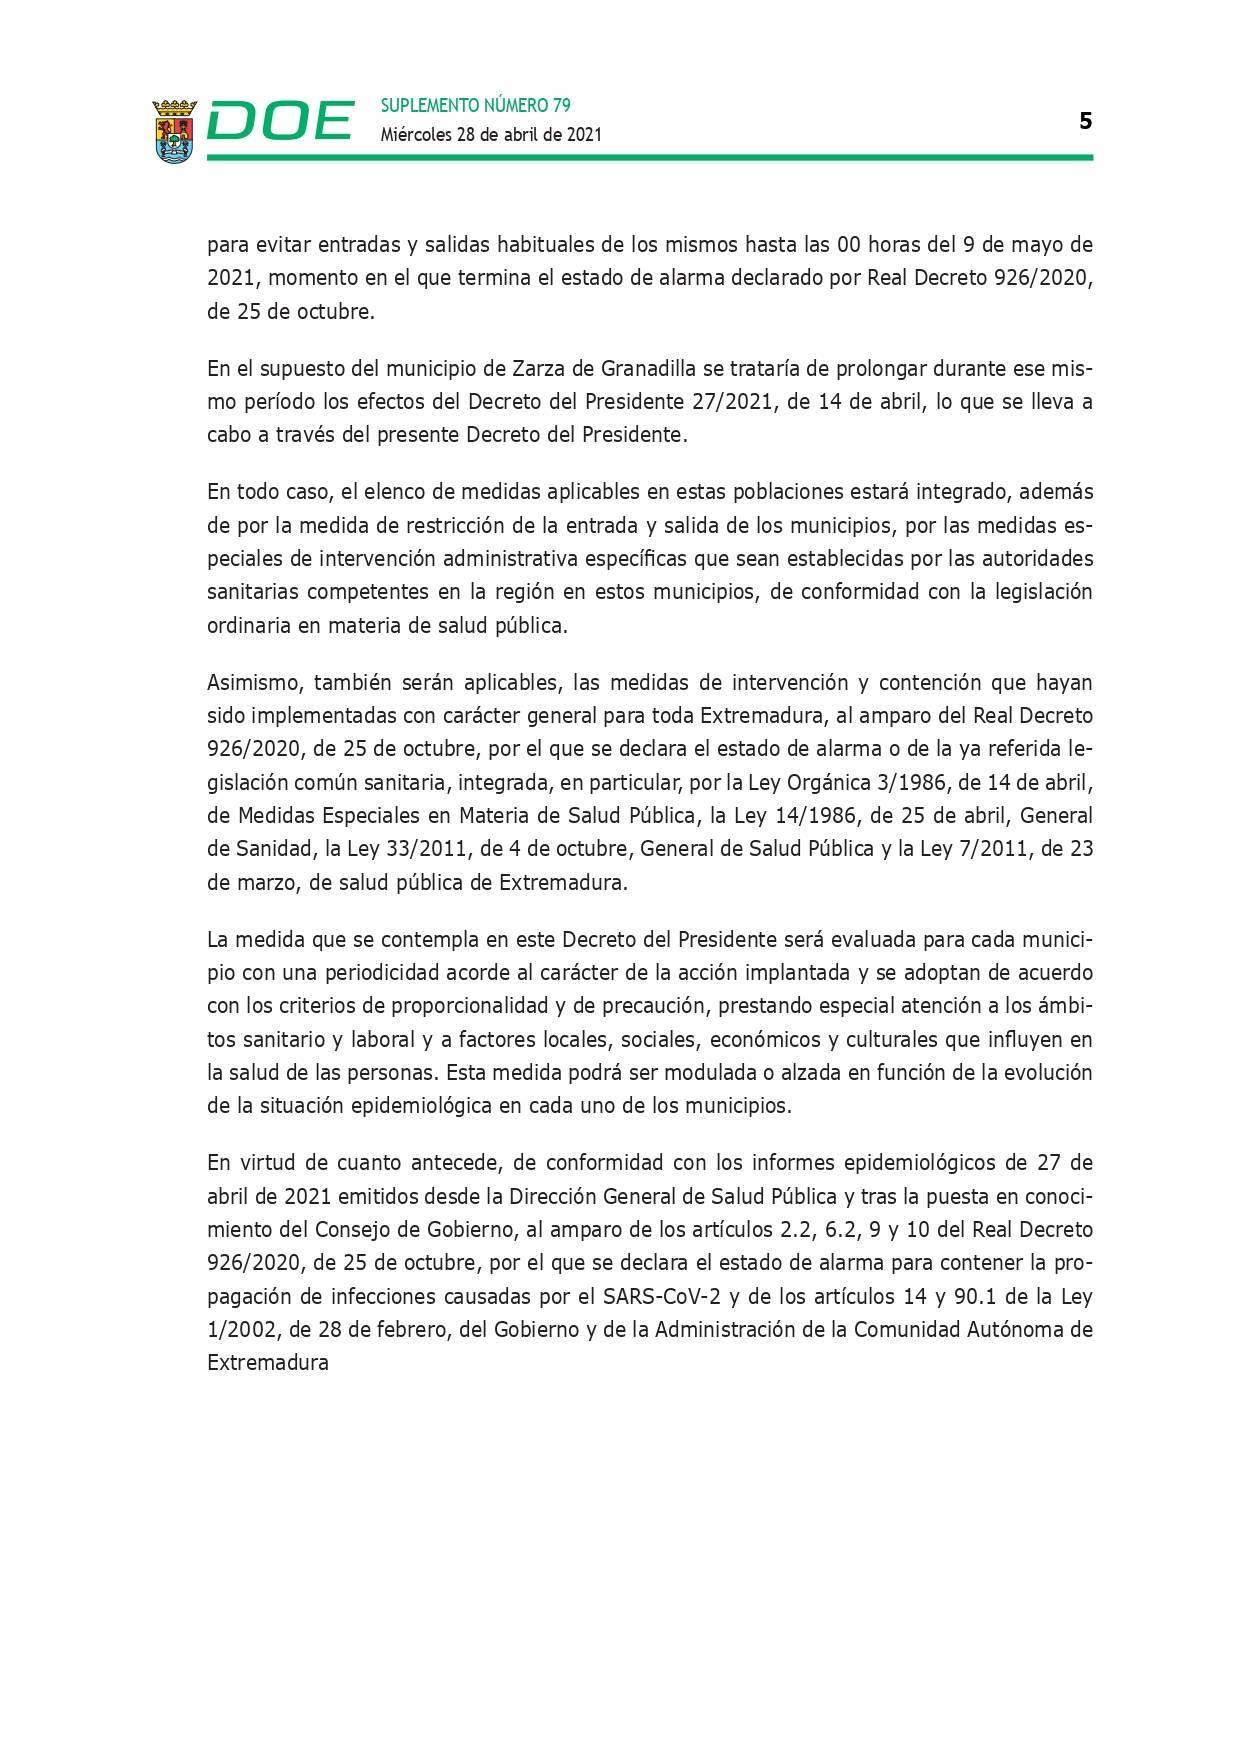 Cierre perimetral por COVID-19 (abril 2021) - Guadalupe (Cáceres) 5